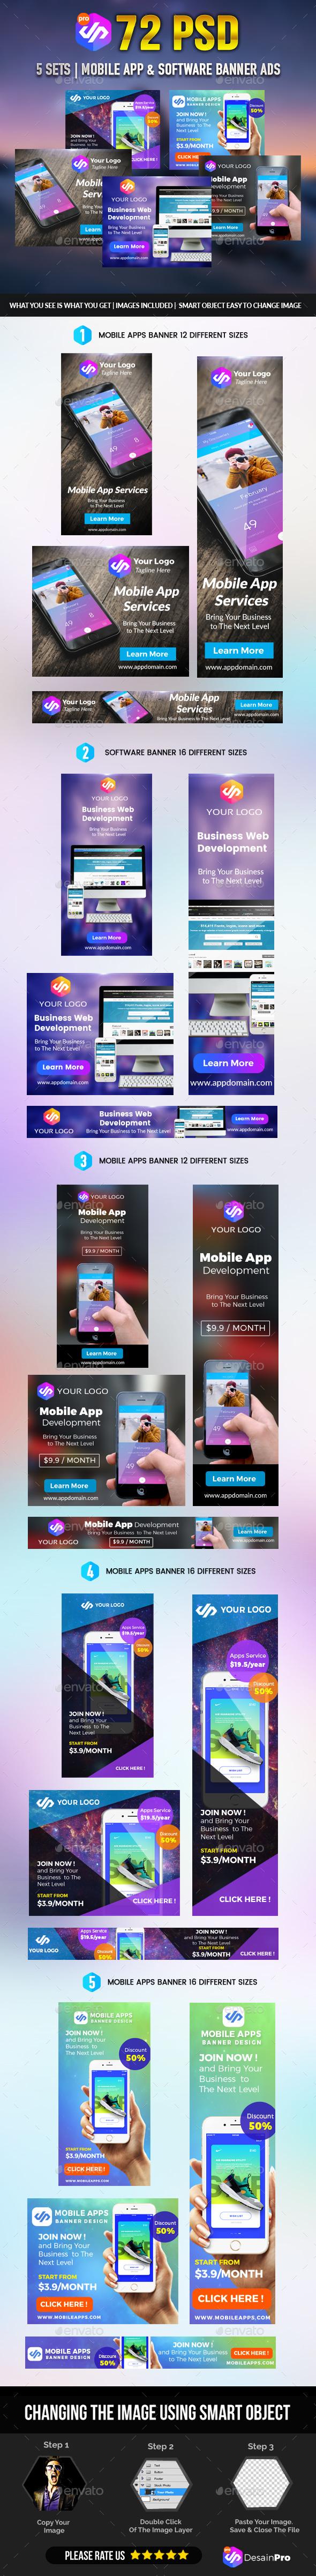 Mobile Apps Banner Pack